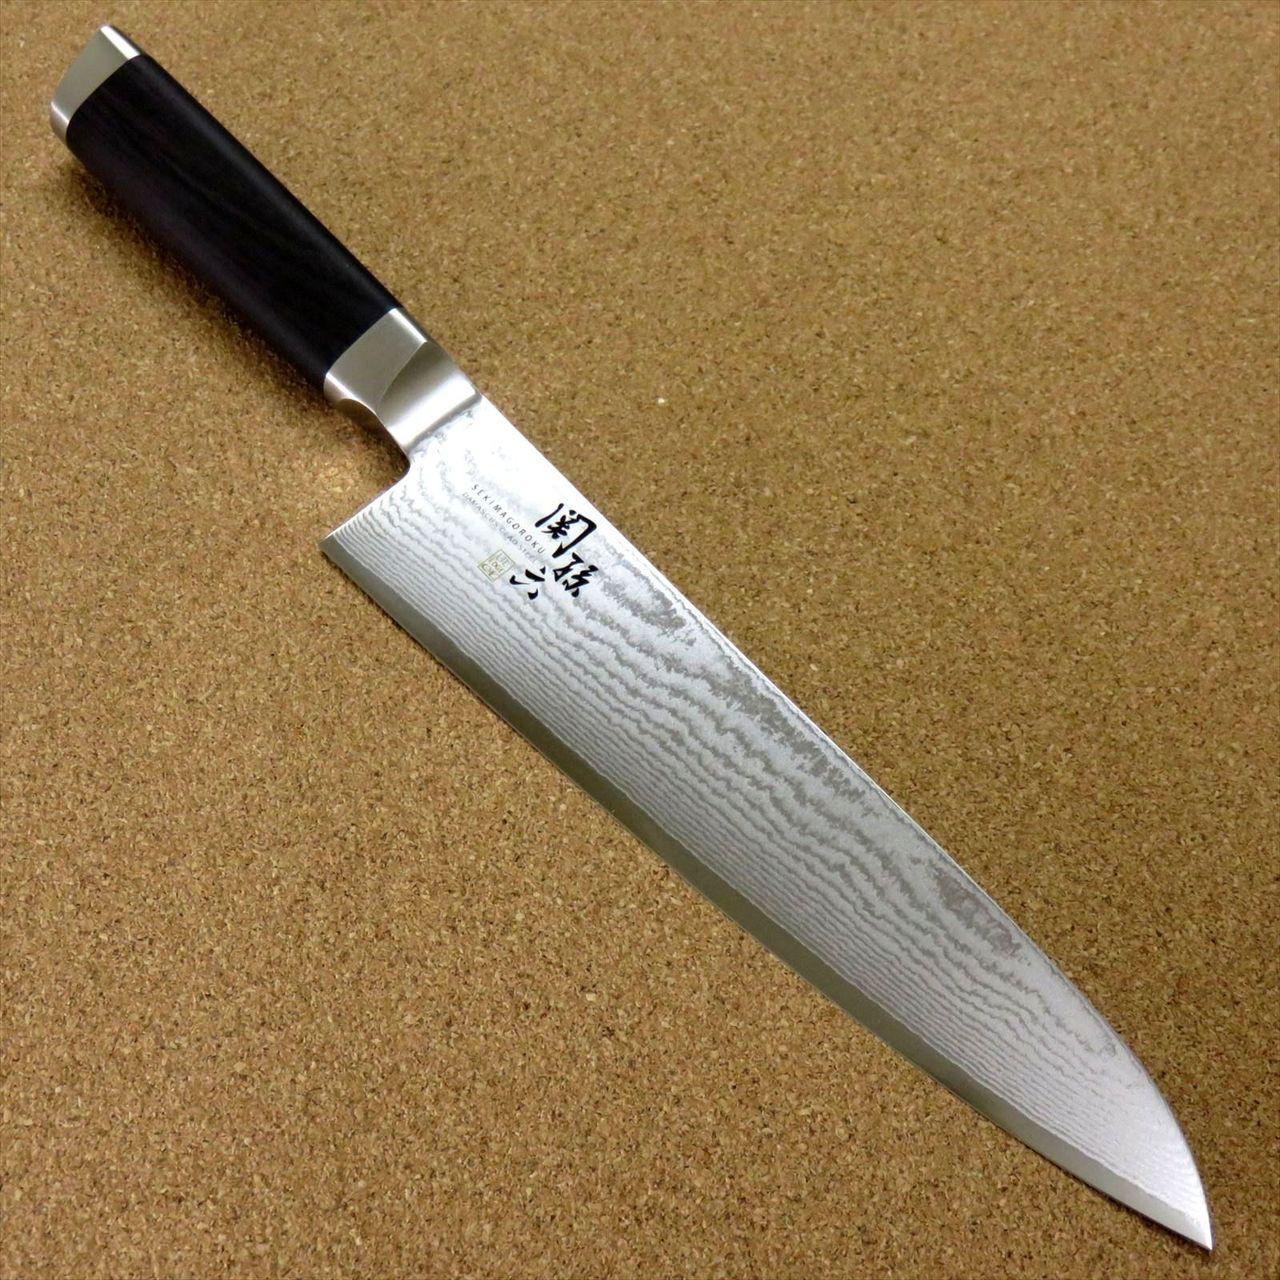 Japanese KAI SEKI MAGOROKU Kitchen Gyuto Chef's Knife 8 3